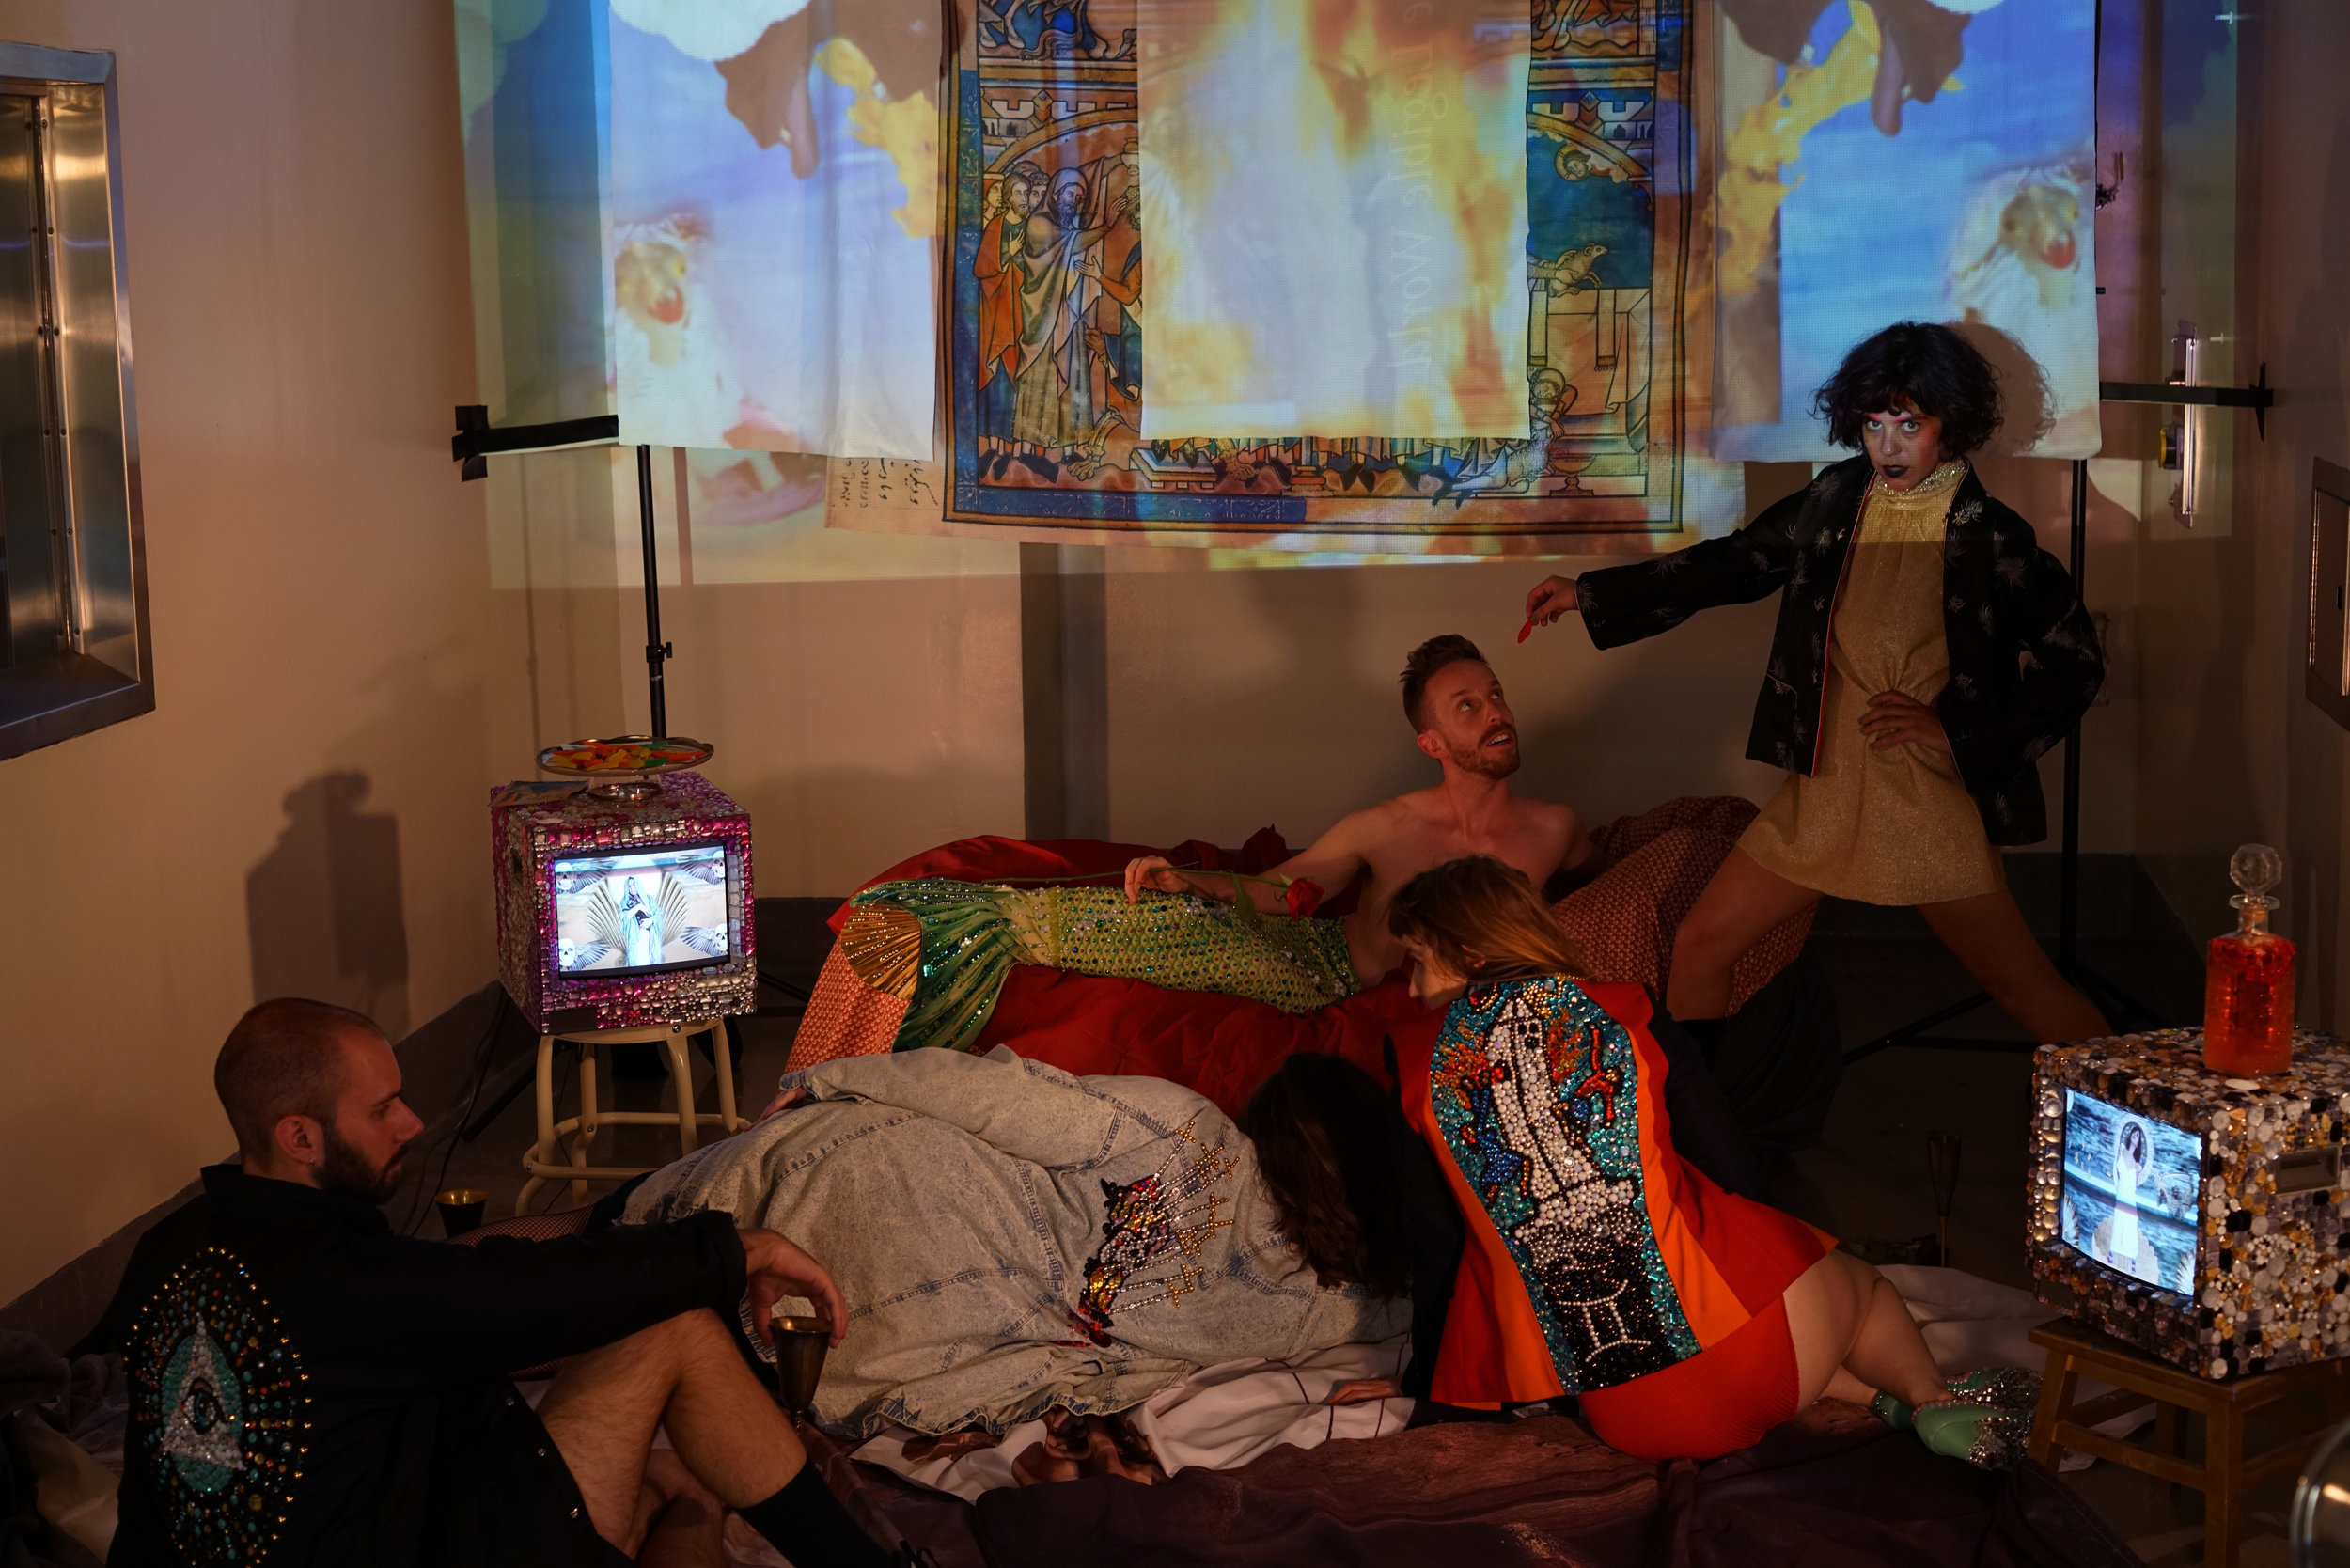 Zito's Chapel   Video and Performance Installation  photos by Tiffany Smith